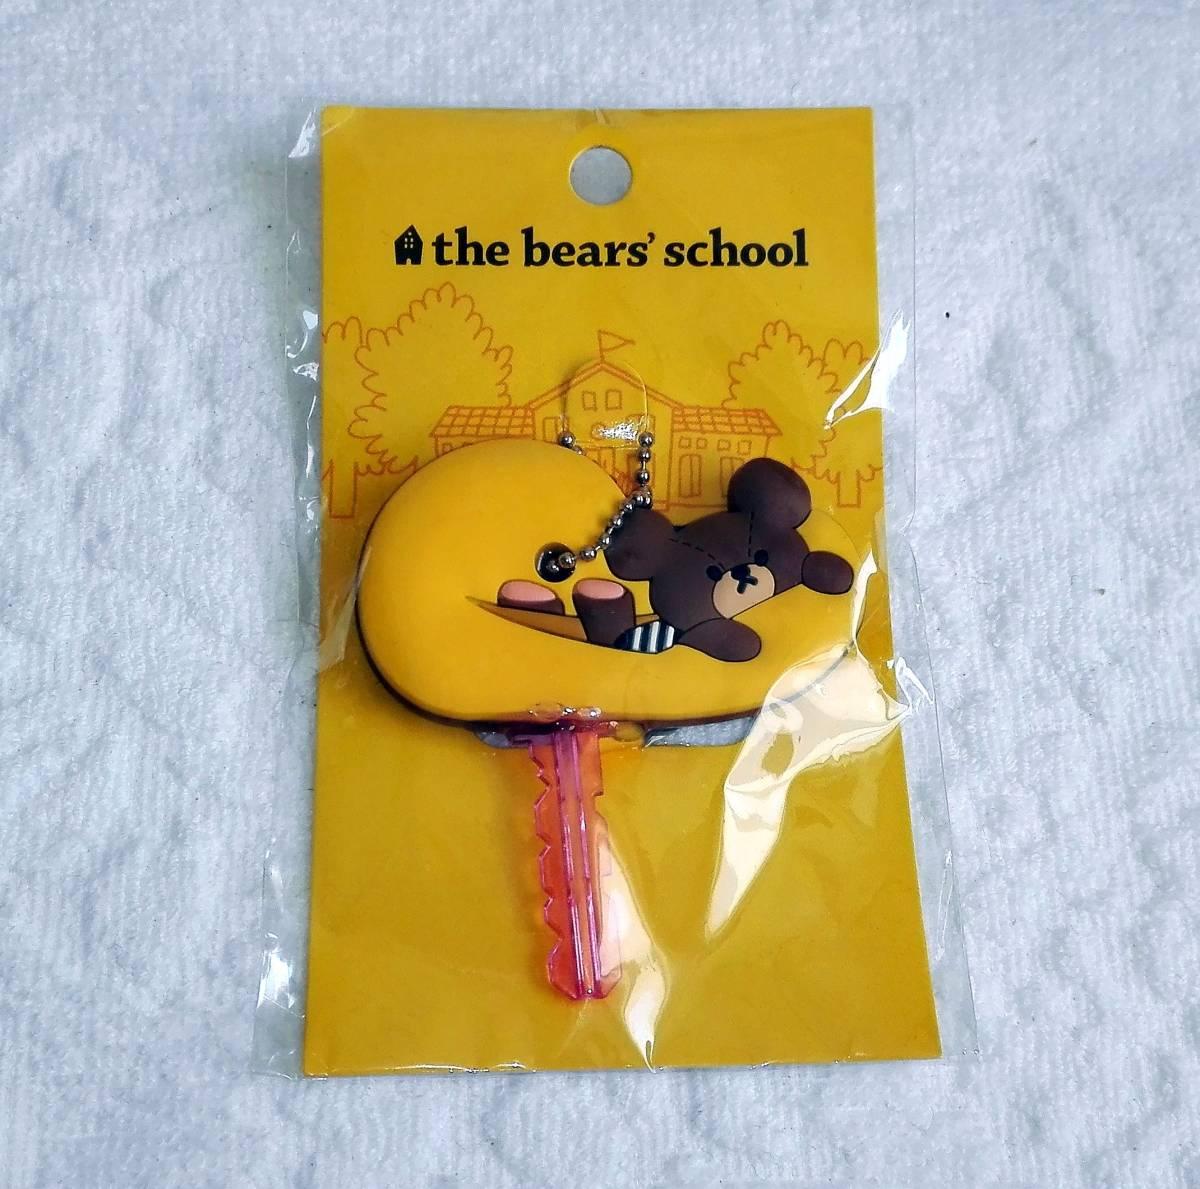 Bandai ... ....the bear*s school ключ meto ключ покрытие ключ держатель тыква хлеб ... .......... домкрат -